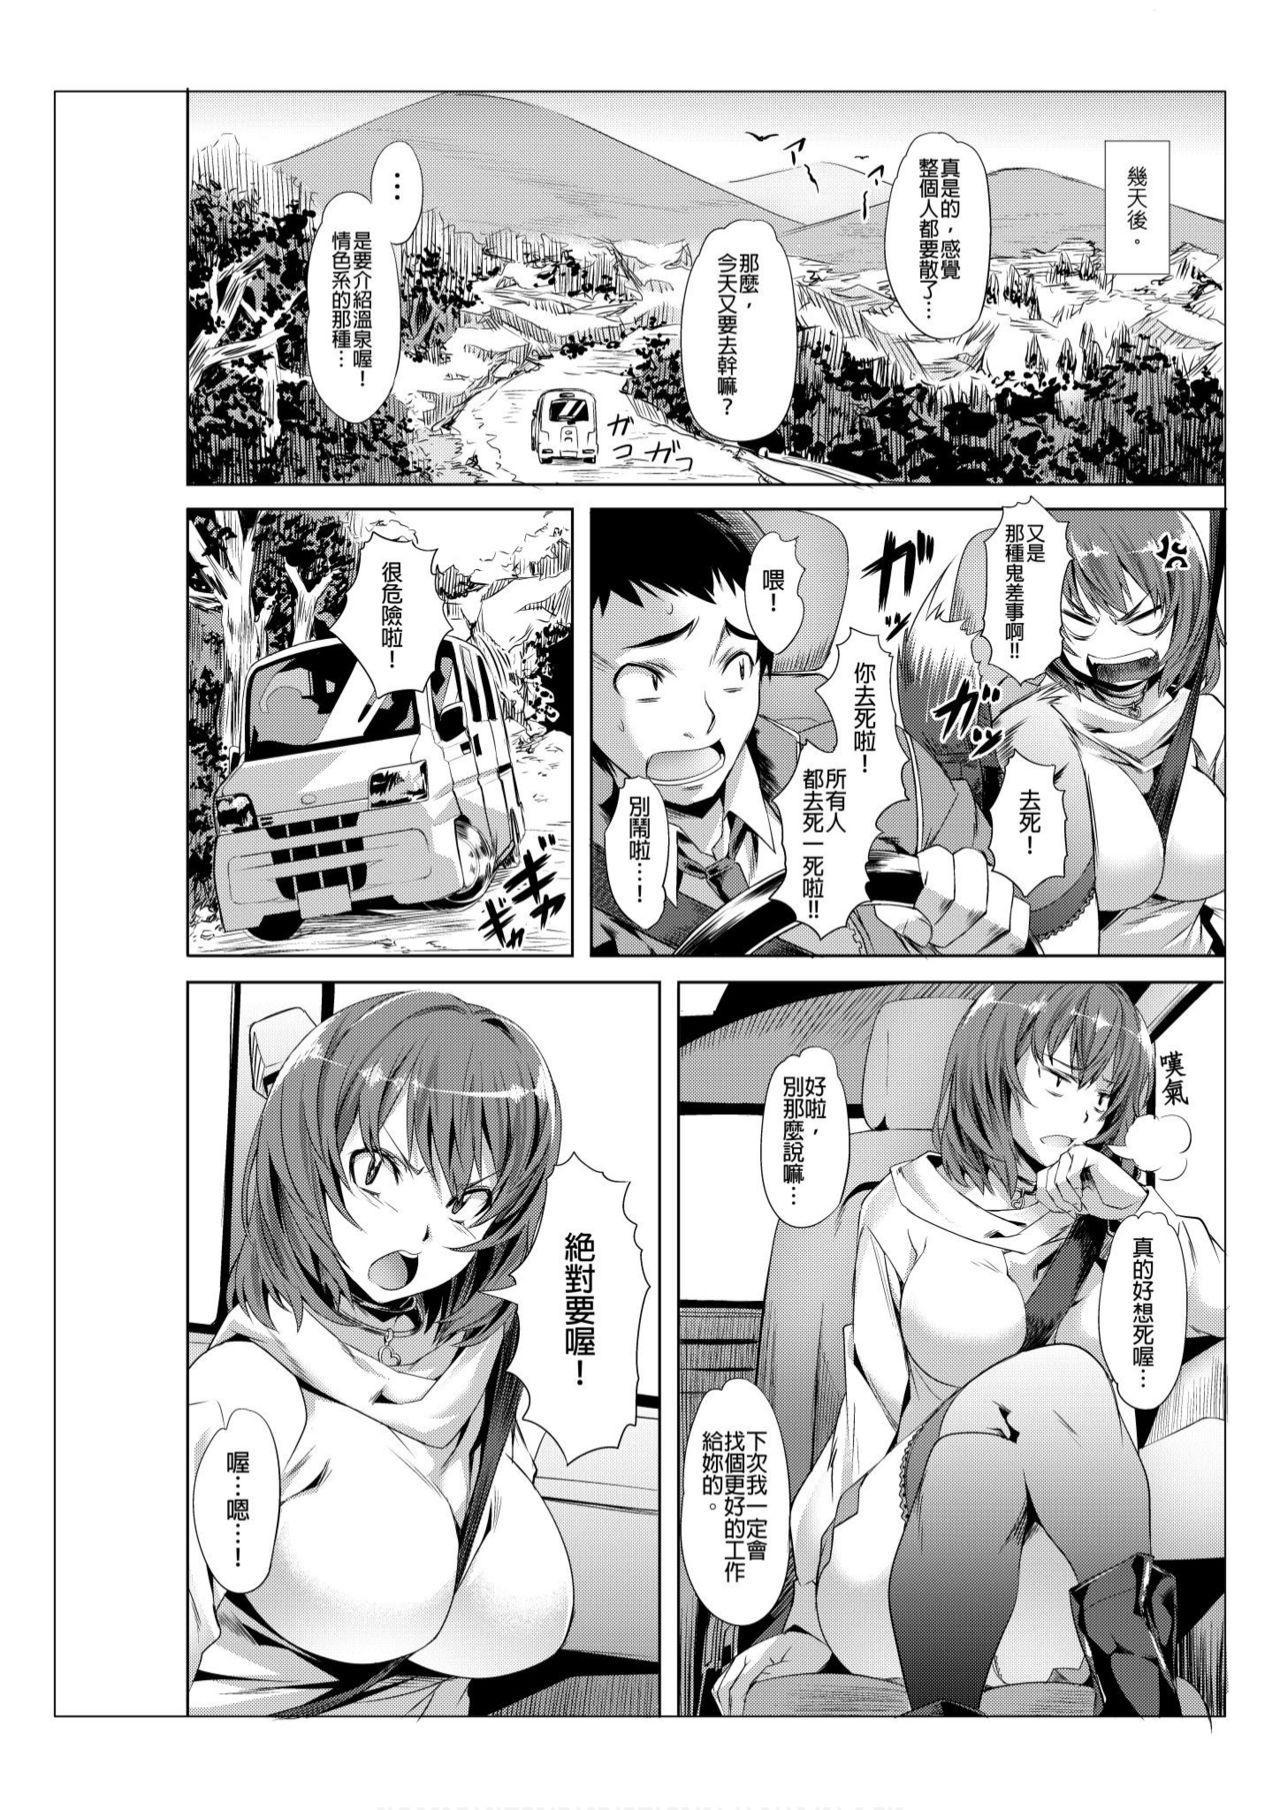 [Nagayori] Towel Ichimai de Otoko Buro.~ Shiranai Ojisan-tachi to Honiki Sex ~ | 只裹了條小毛巾就進男浴池的我。~被完全不認識的大叔們弄到高潮了~ [Chinese] [Decensored] 4